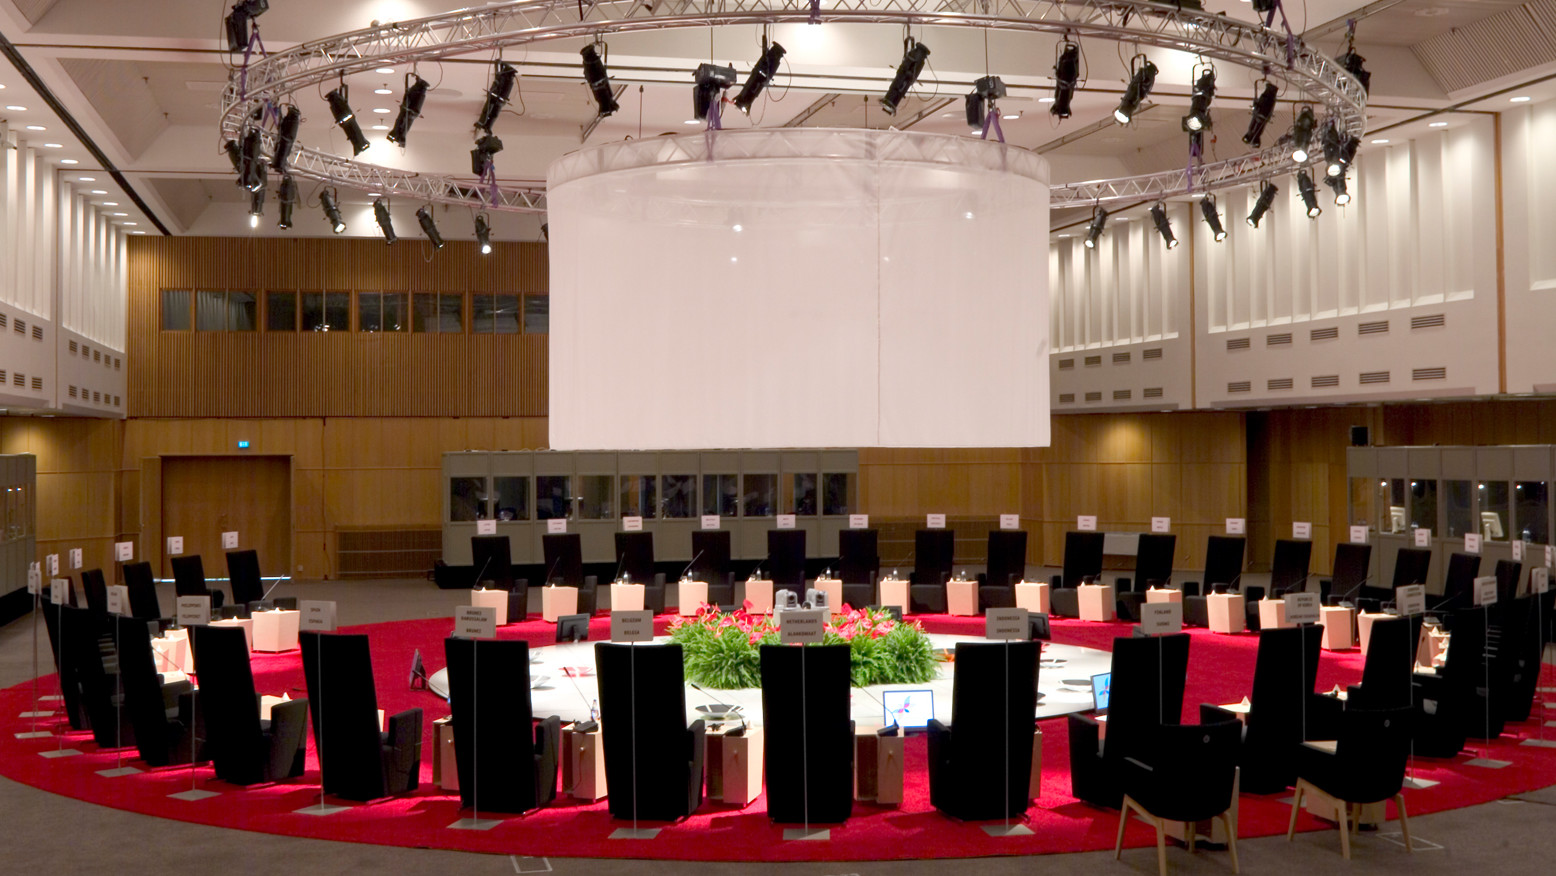 EU-Conferences-2006-helsinki-GI-project-6